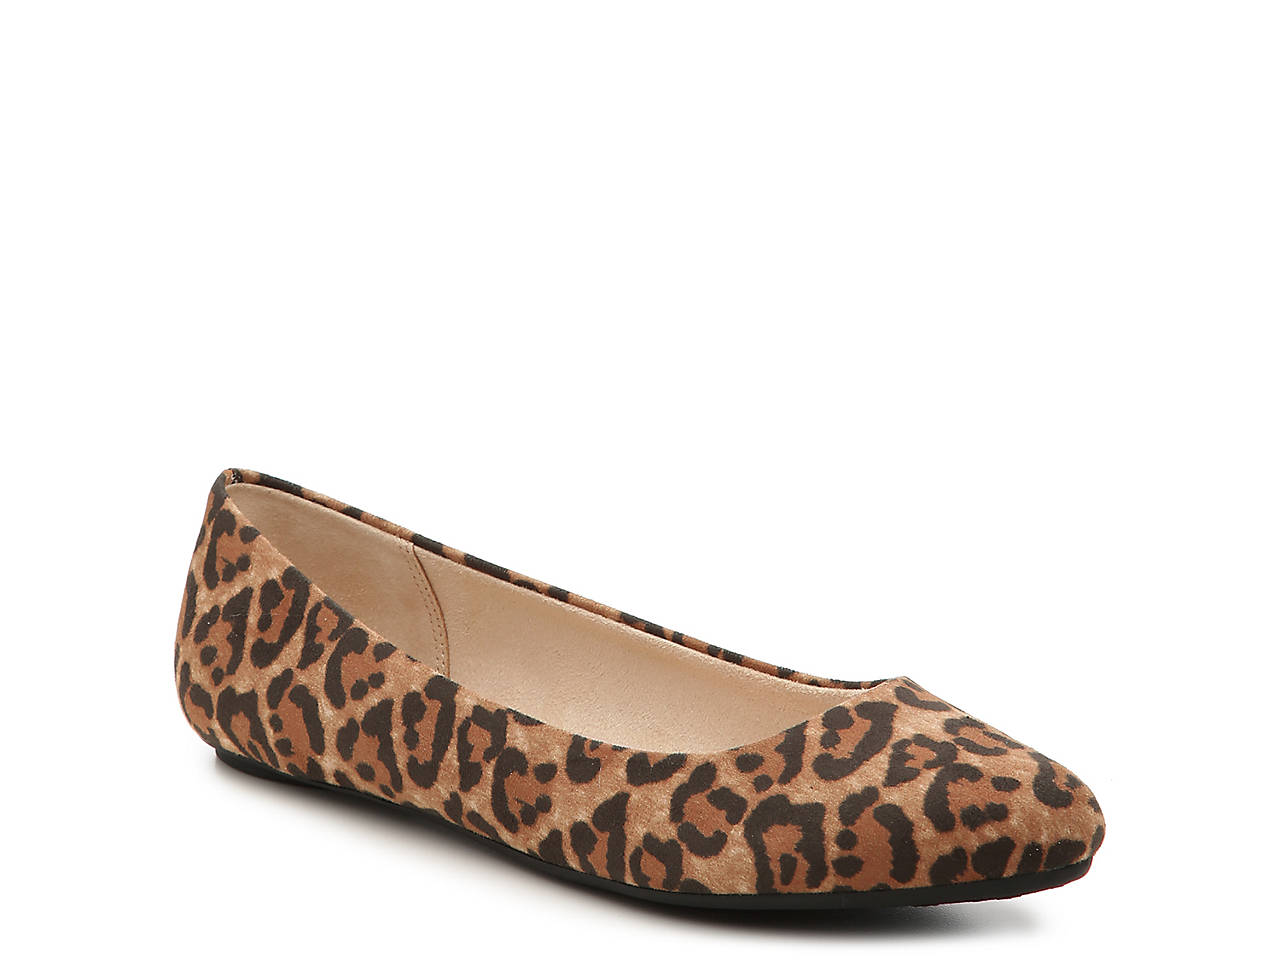 78ab6fe1bae0 Kelly   Katie Pirassa Ballet Flat Women s Shoes